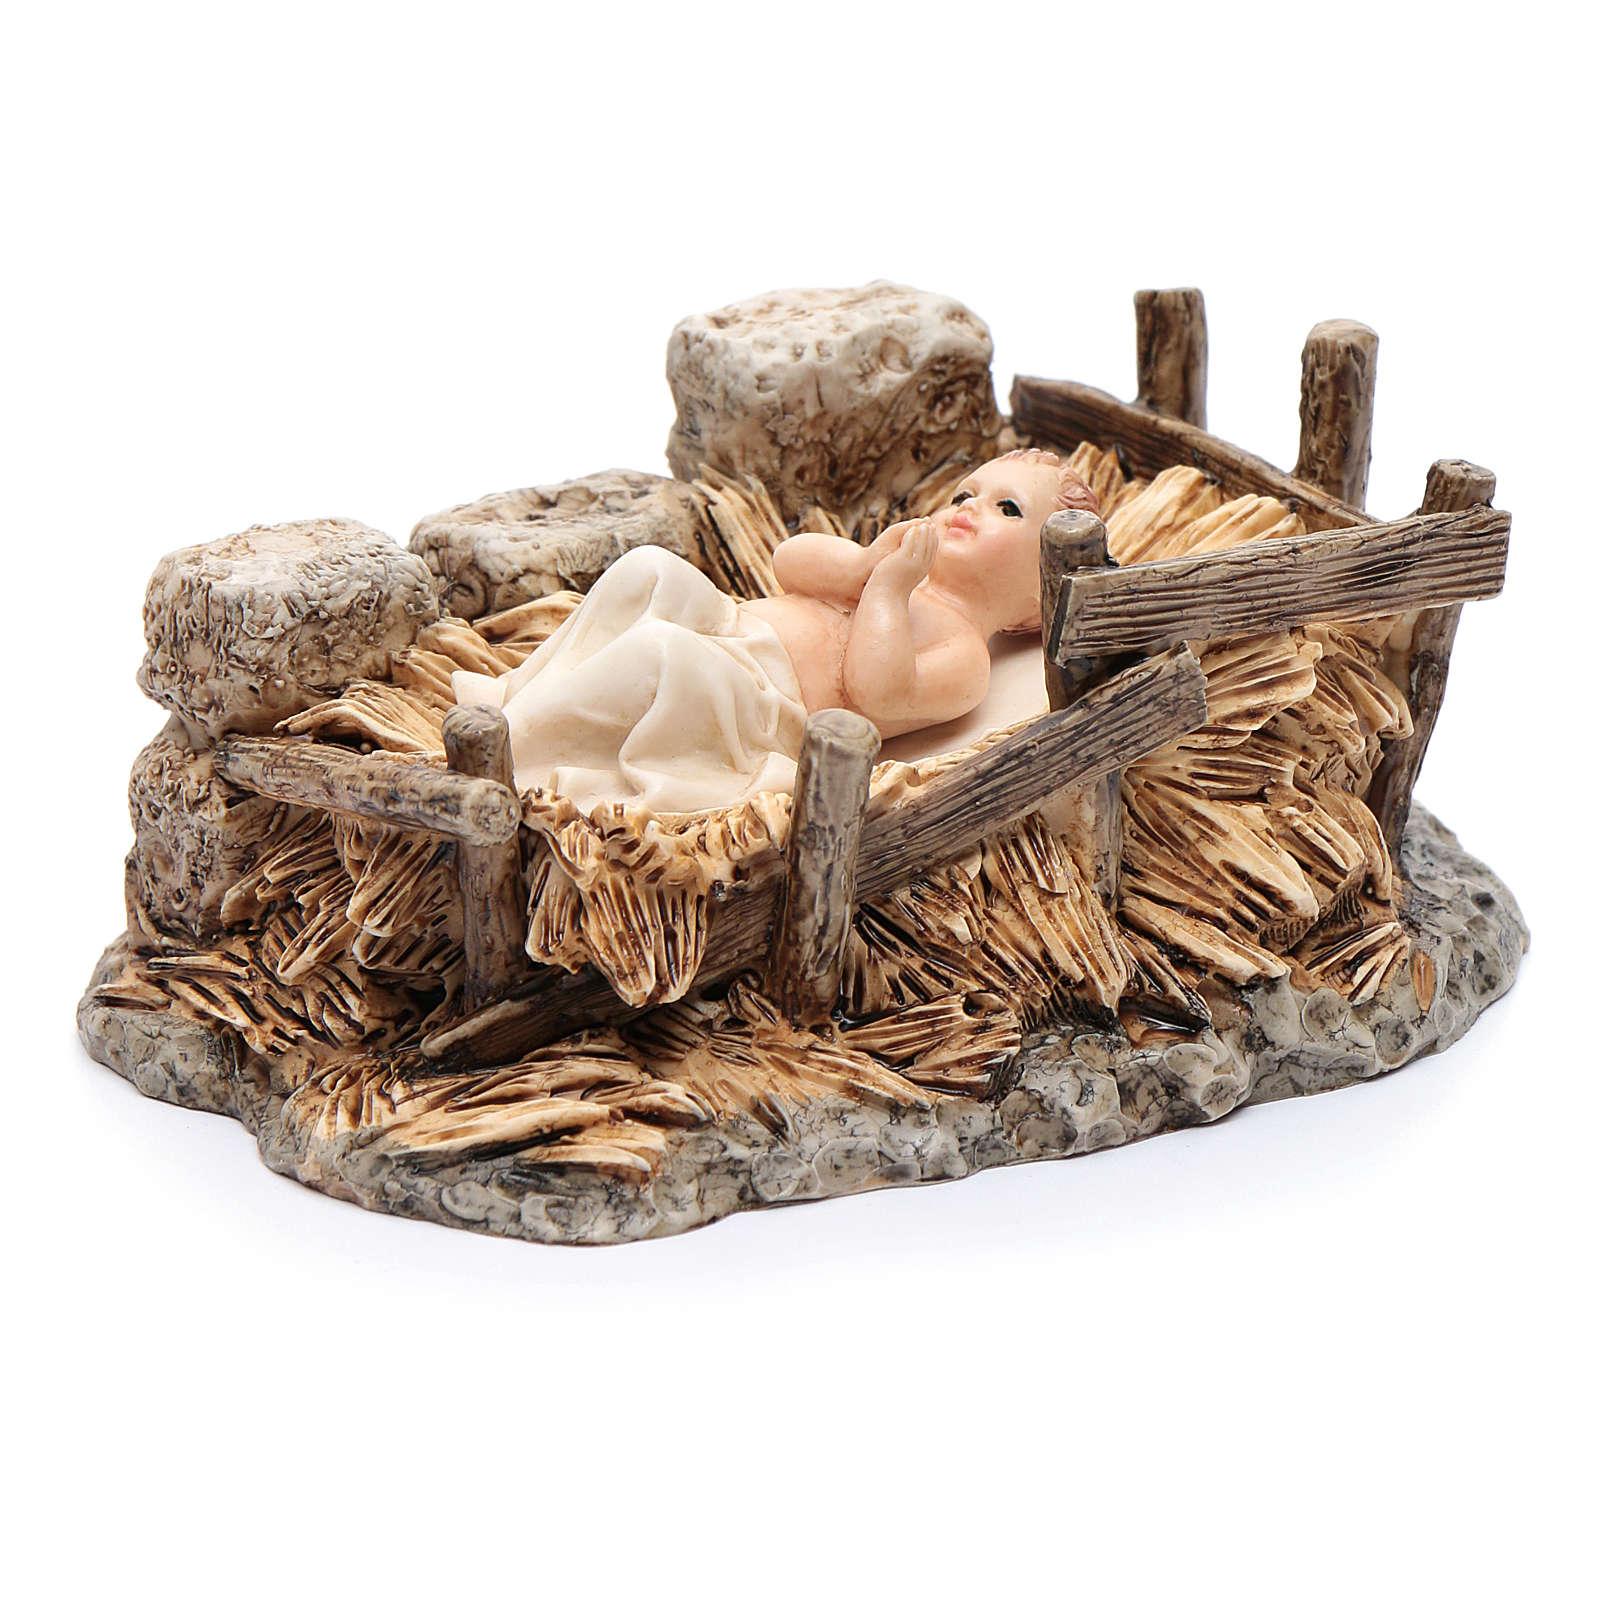 Gesù bambino con culla resina 15 cm Moranduzzo 4